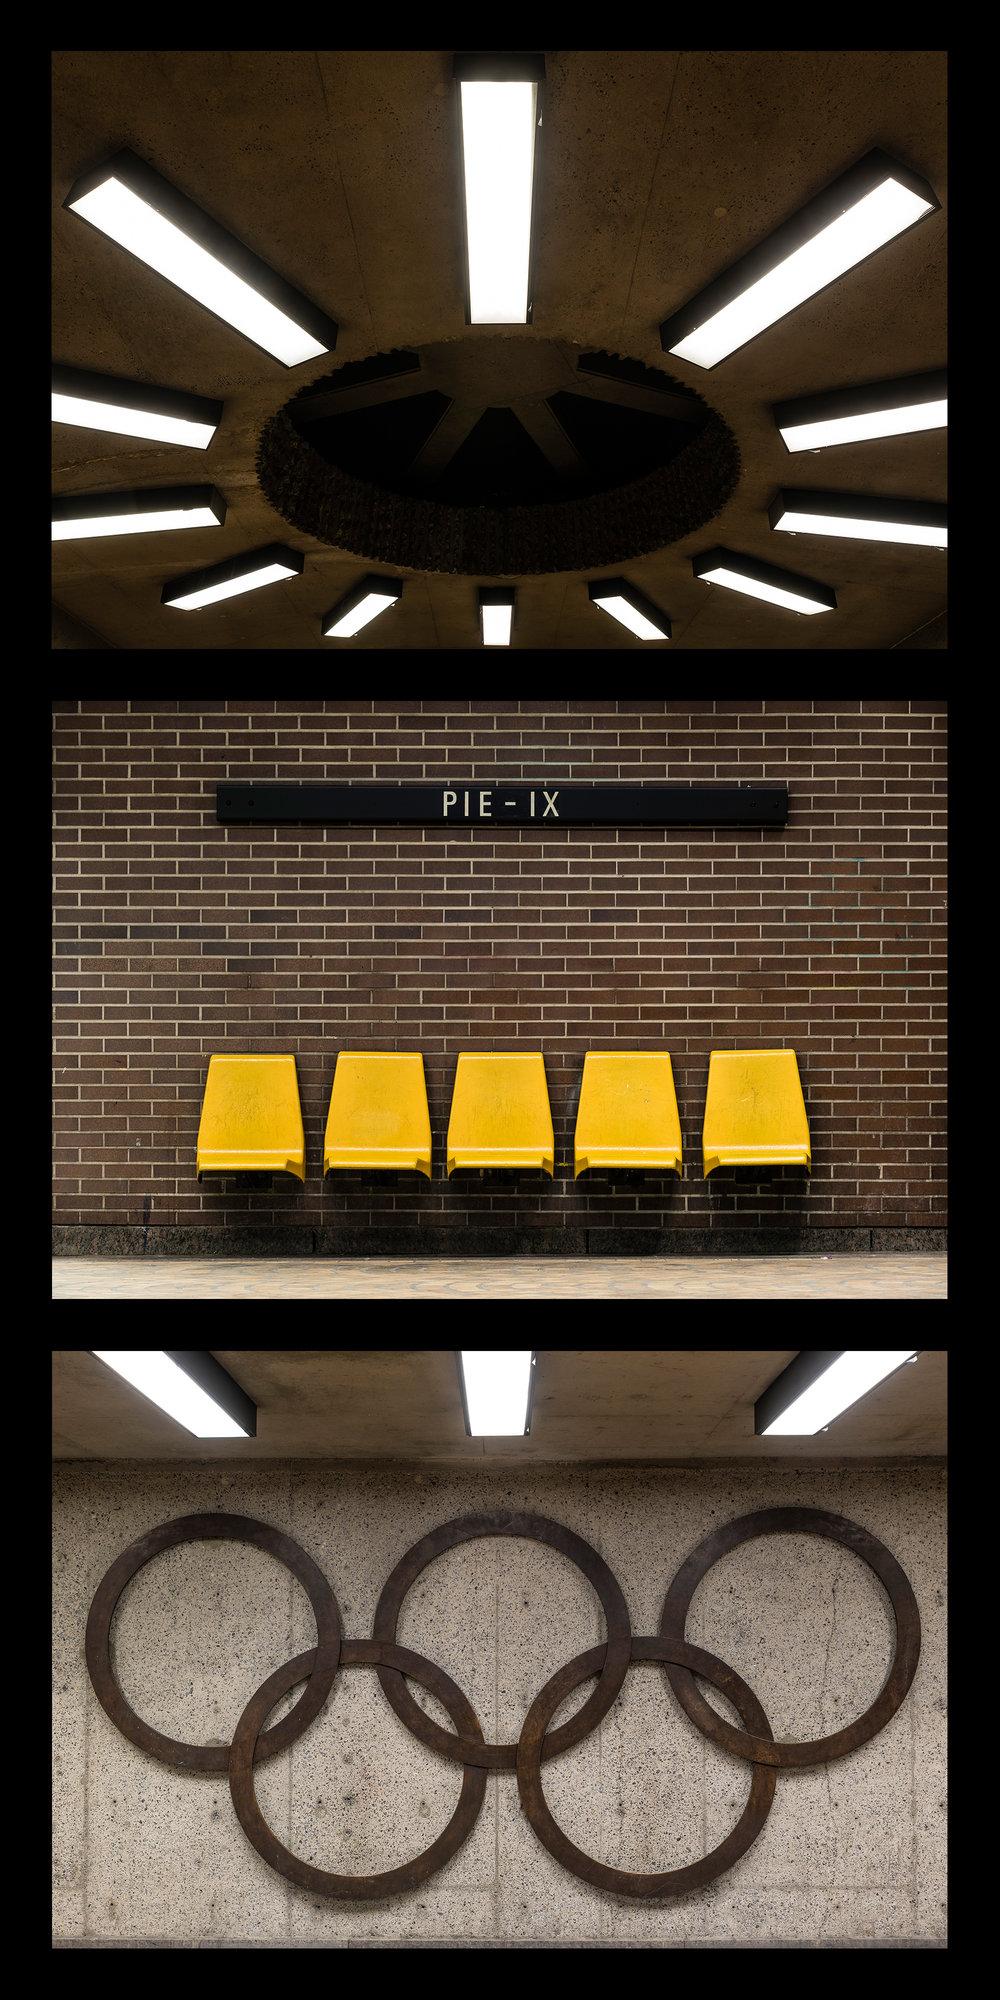 Pie-IX.jpg